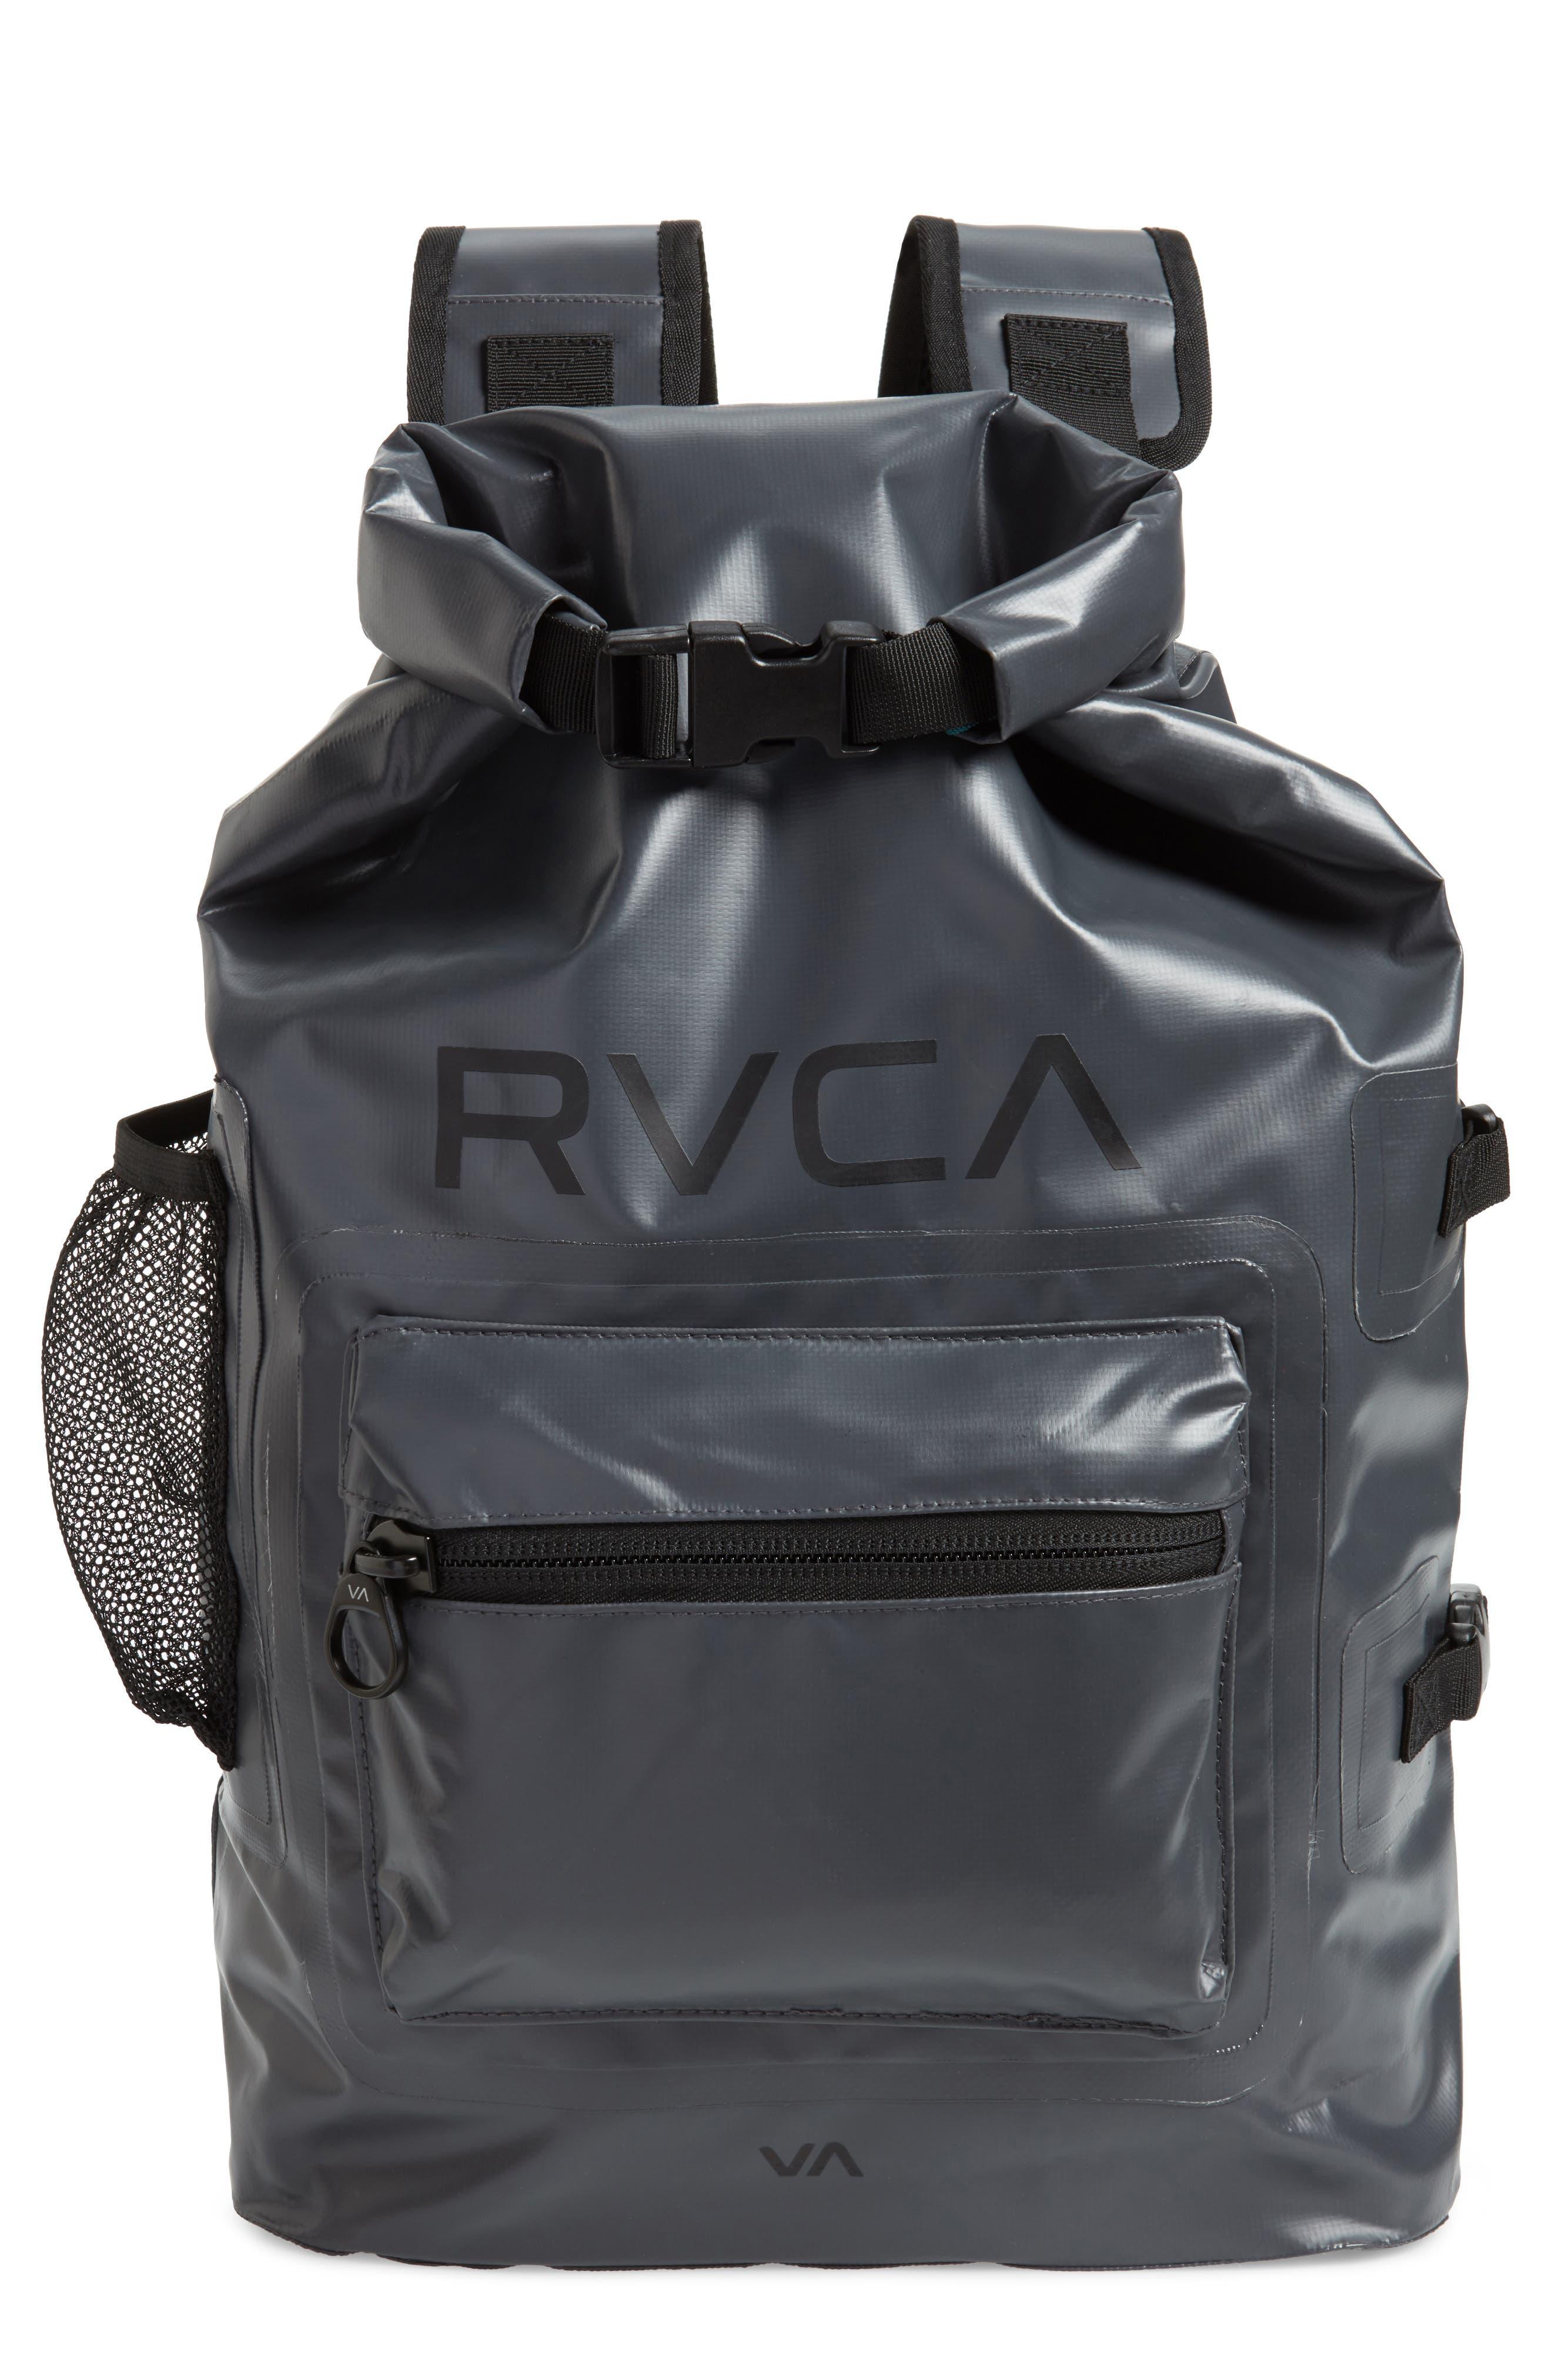 Go Be II Waterproof Backpack,                             Main thumbnail 1, color,                             Charcoal